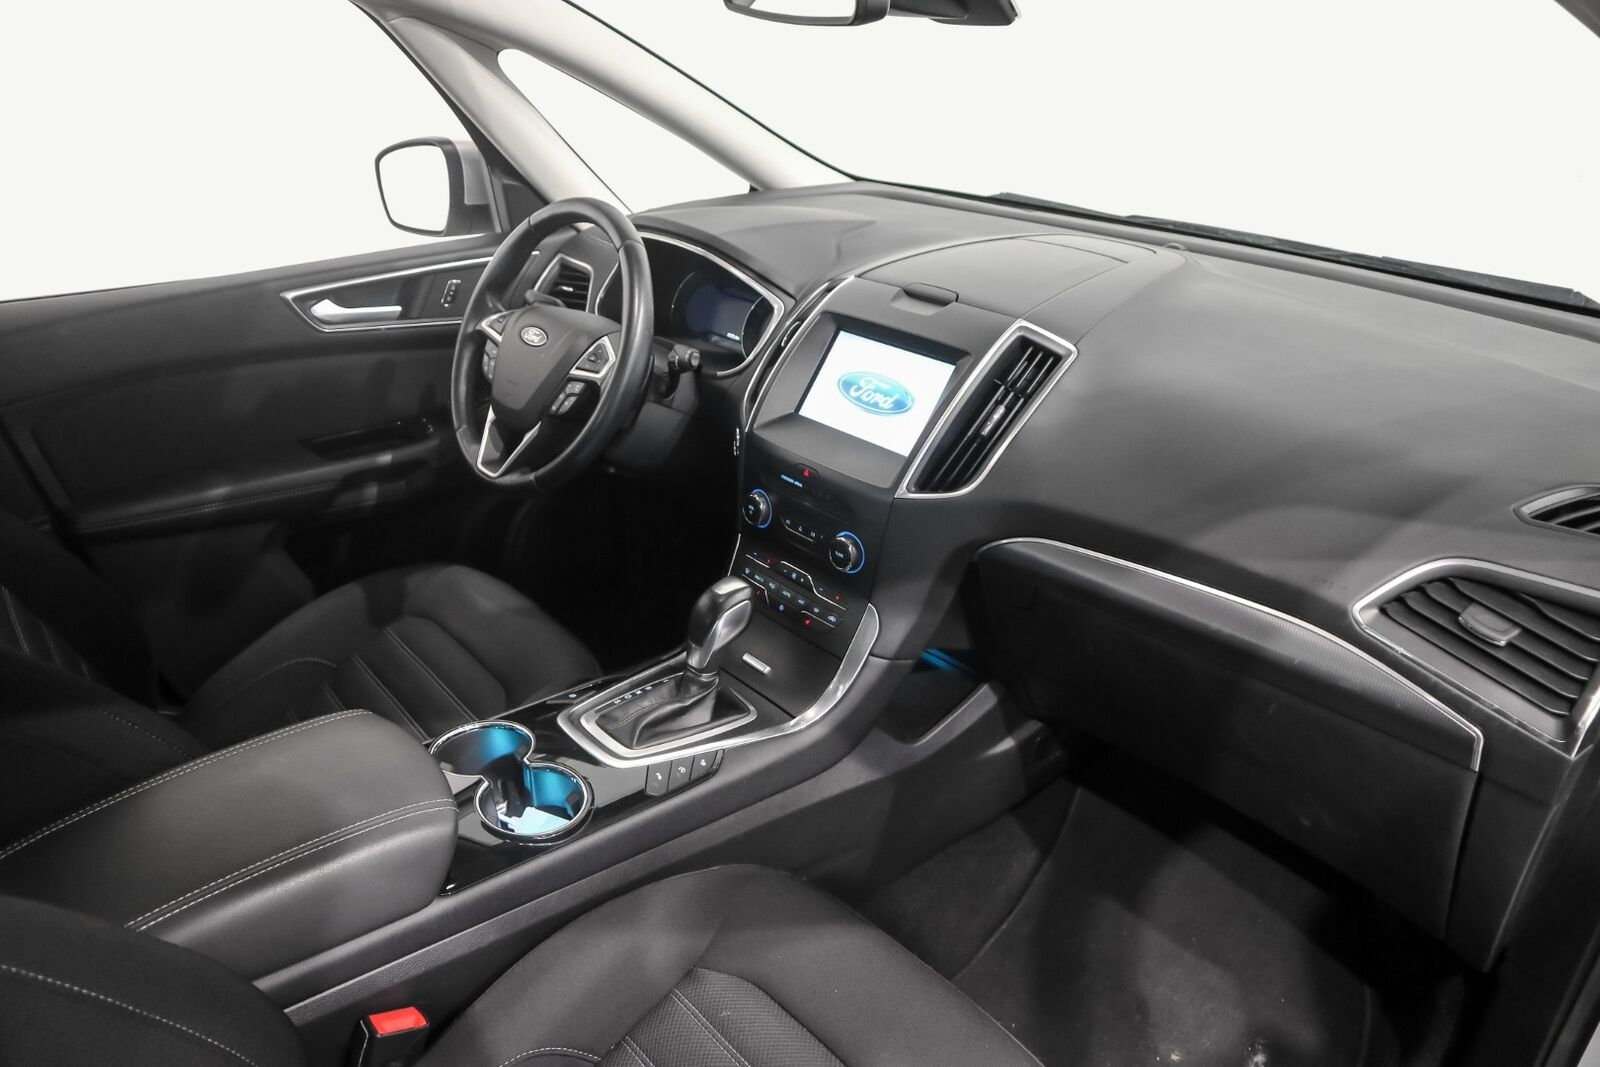 Ford Galaxy 2,0 TDCi 150 Titanium aut. - billede 5